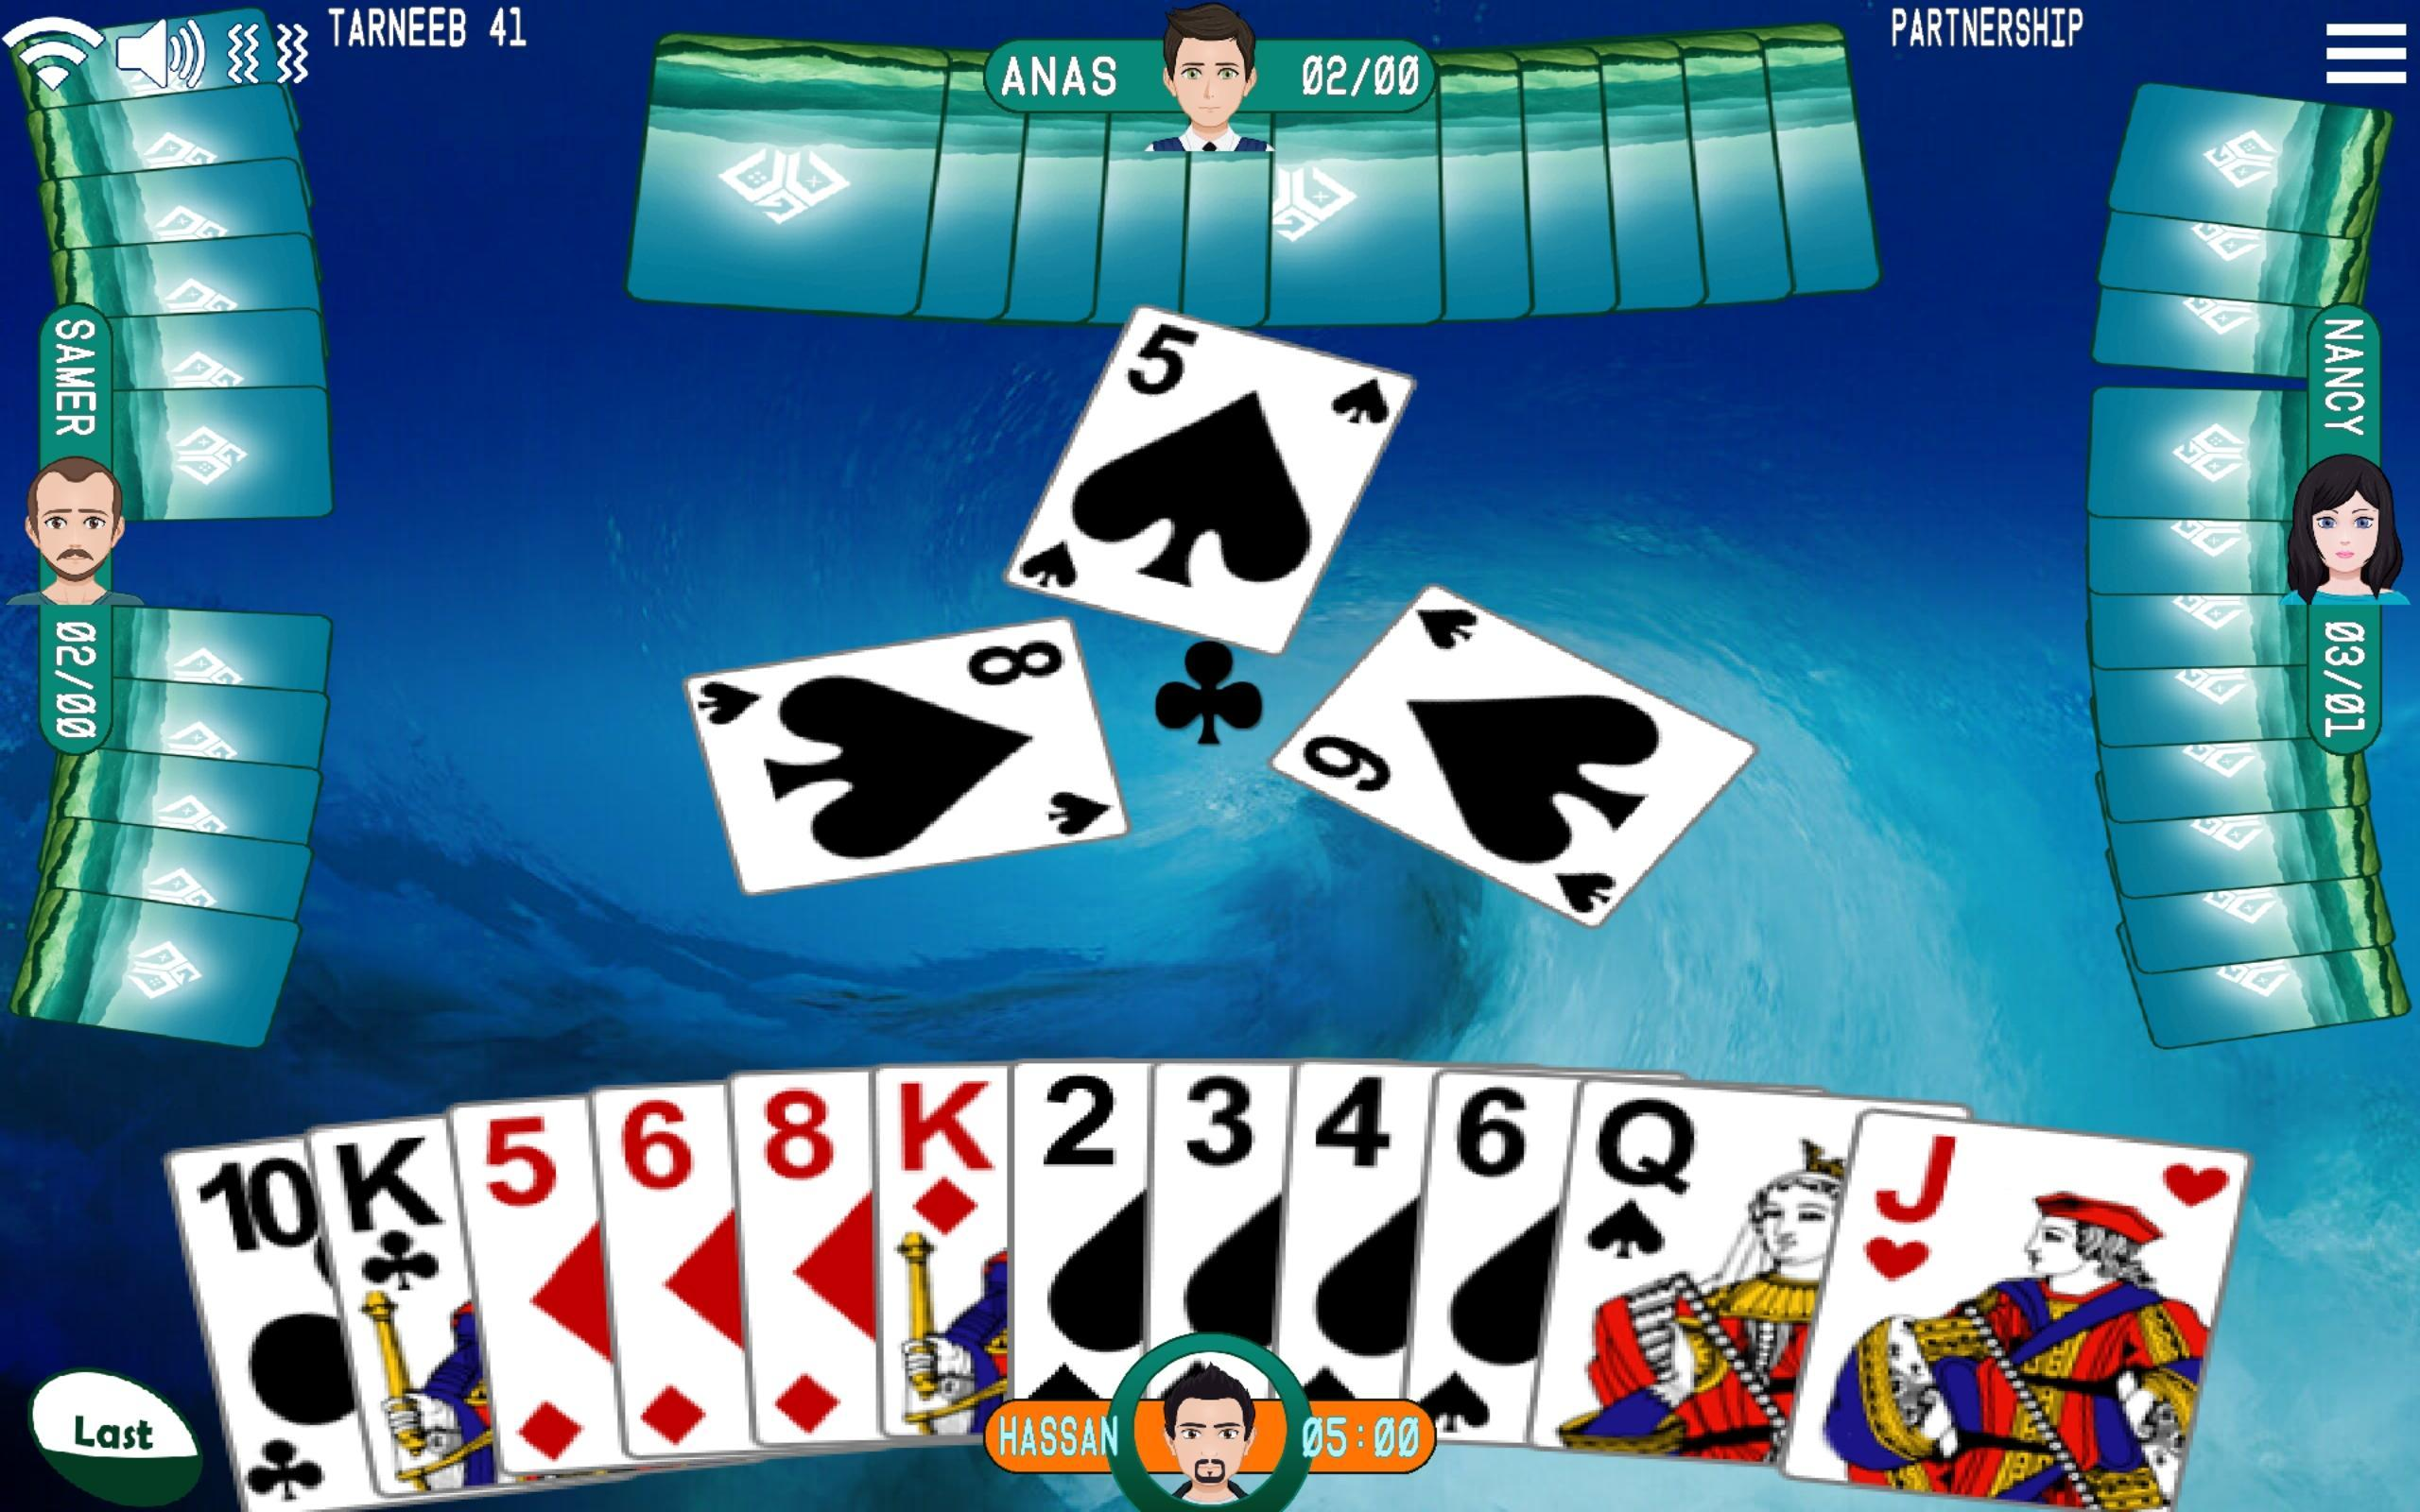 Golden Card Games (Tarneeb - Trix - Solitaire) 20.1.1.30 Screenshot 1